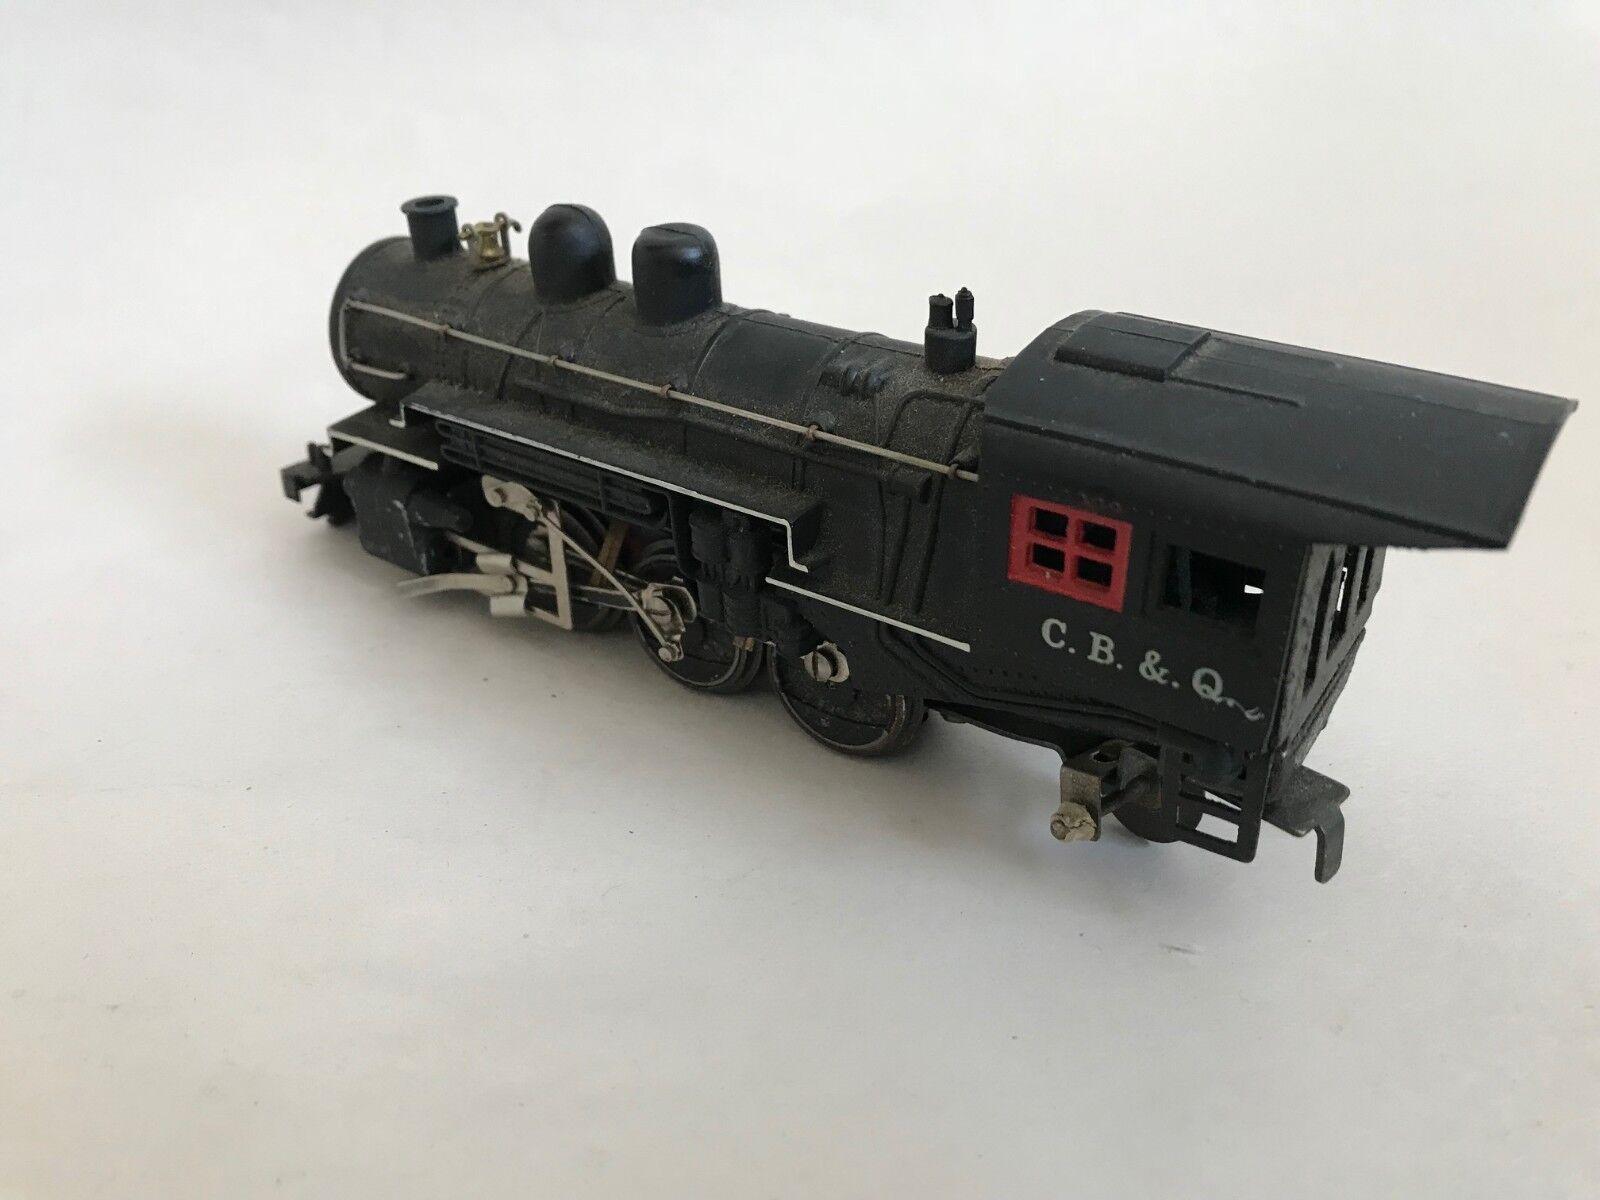 salida Vintage C.B. & Q. modelo modelo modelo del FerroCocheril Tren-falta 2 Ruedas-Hecho en Japón  al precio mas bajo